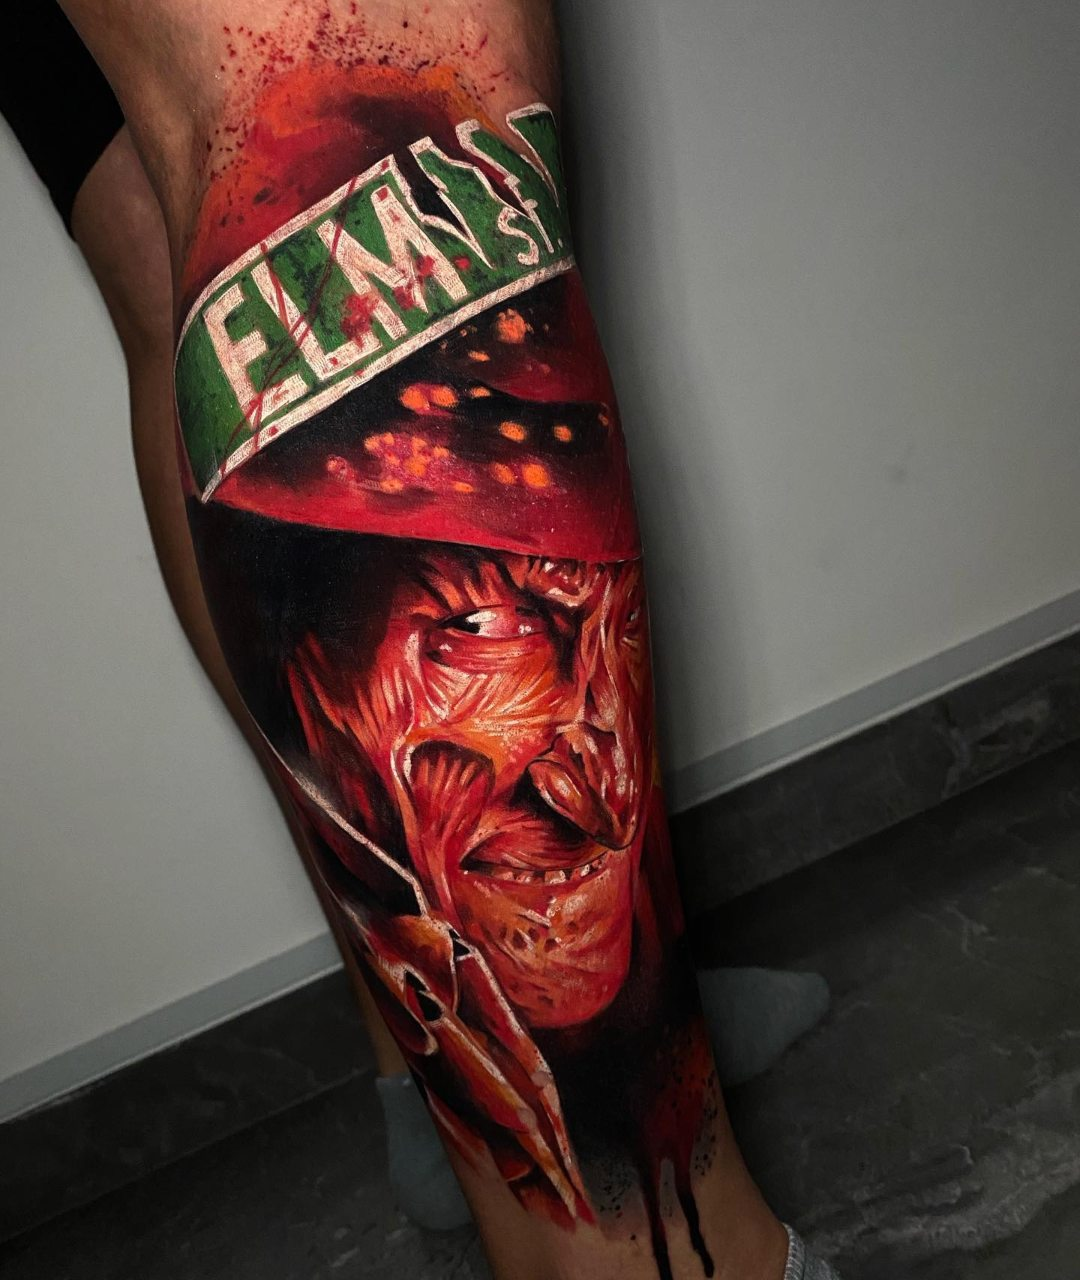 Freddy Krueger tatuaje